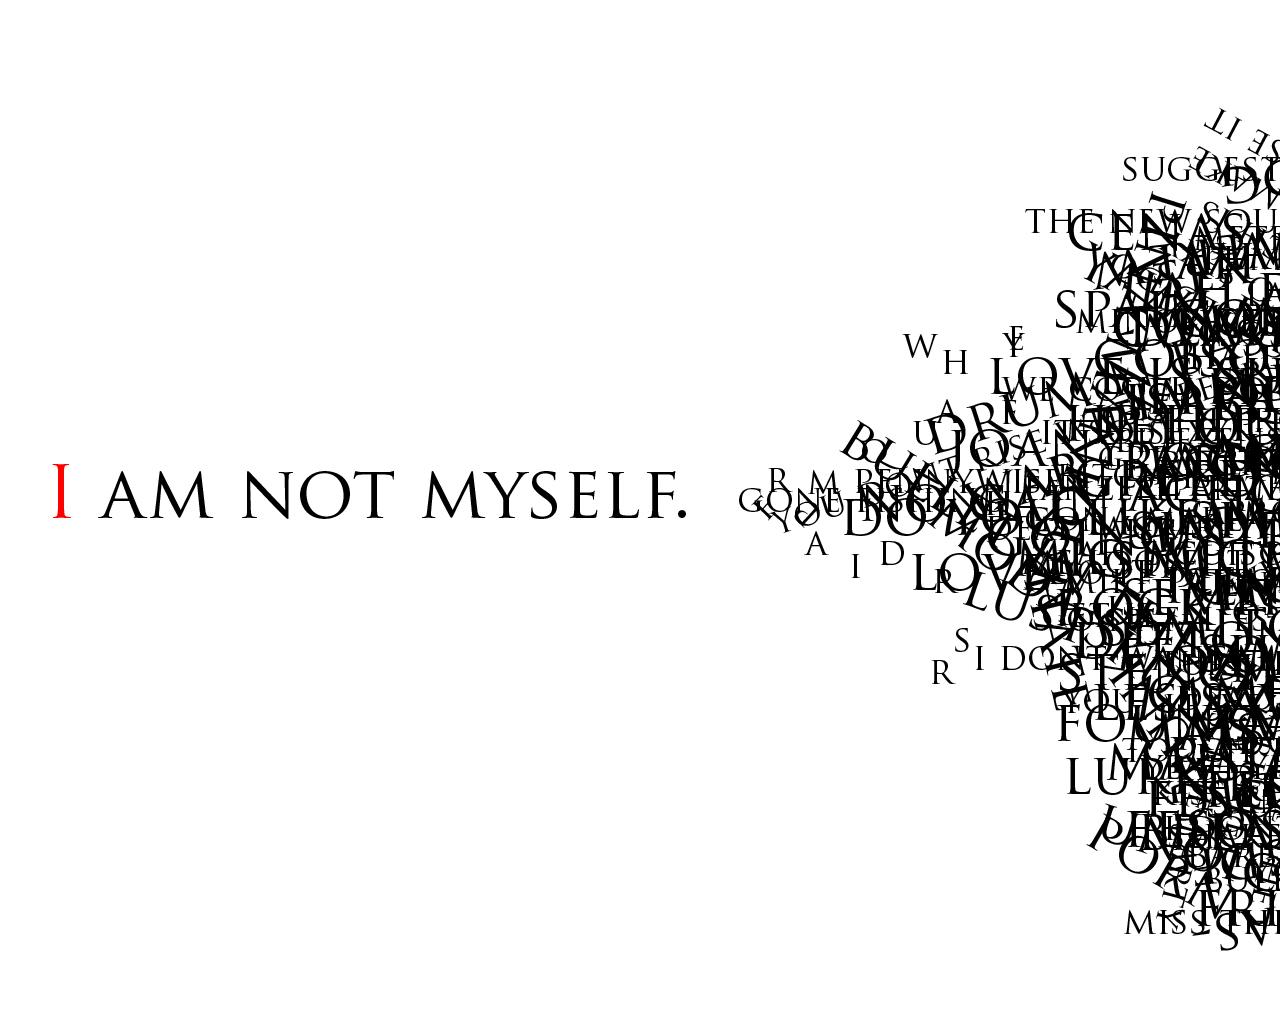 font embedding - I AM NOT MYSELF